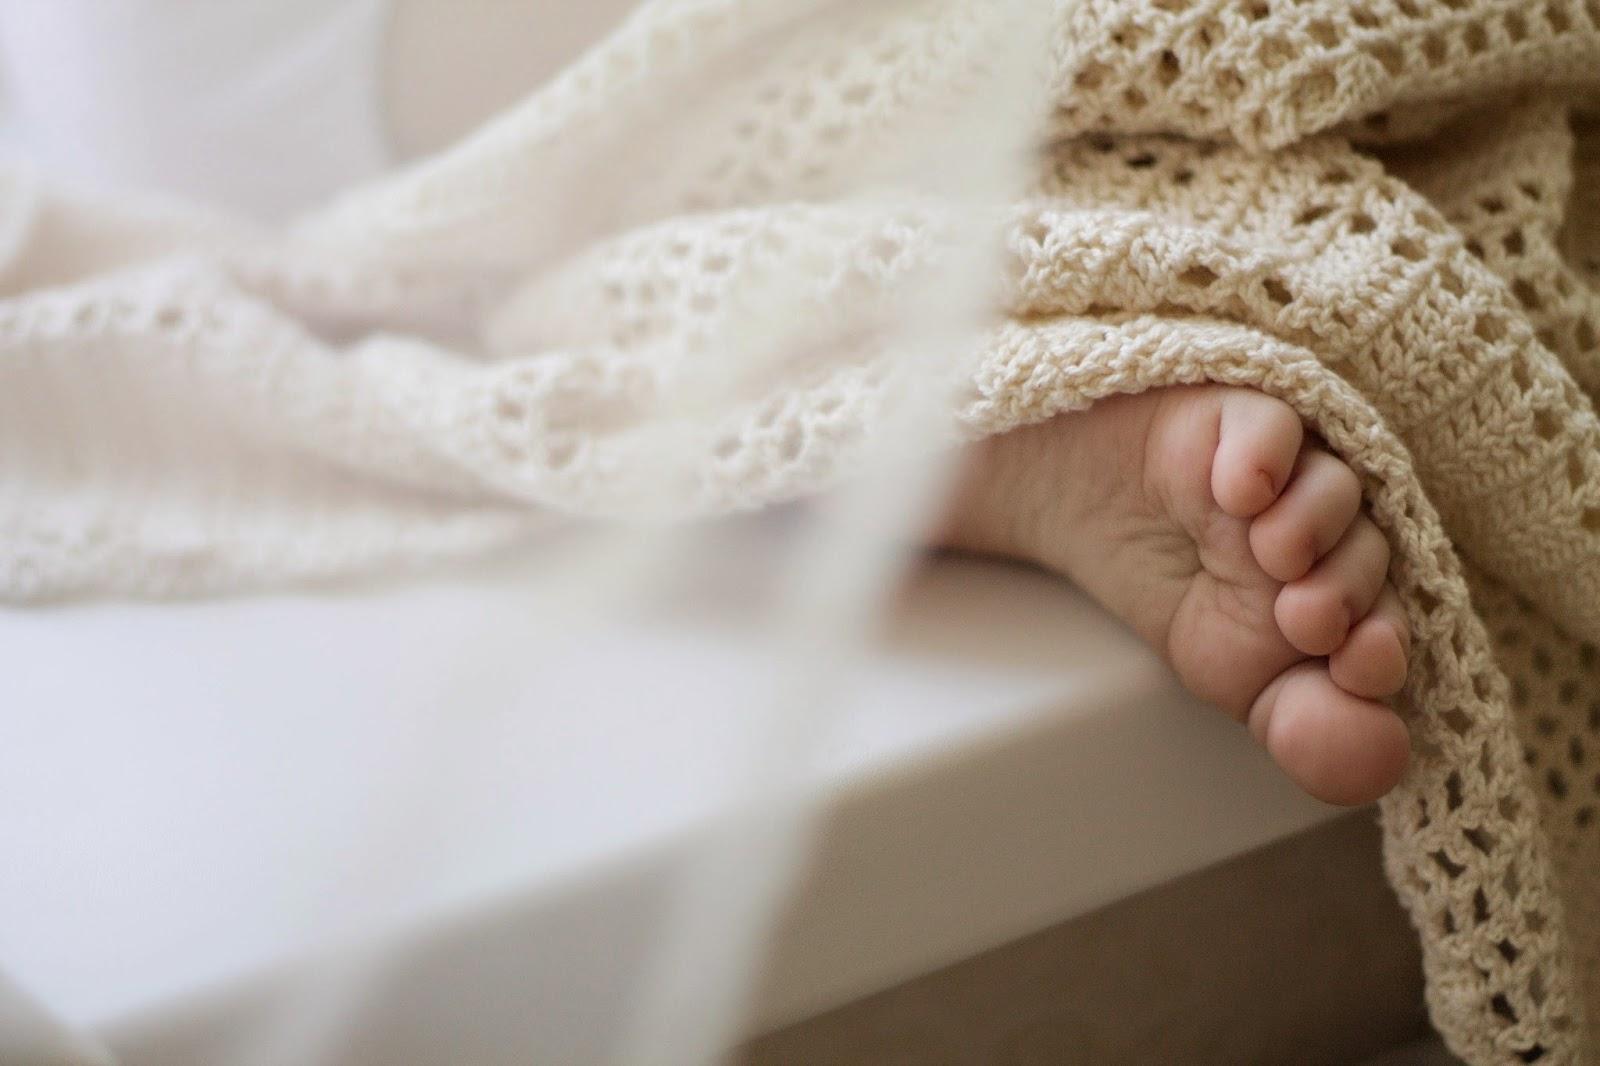 филейное вяание, котята, котята филейным вязанием, плед, плед филейны вязанием, плед для ребенка, пледик, плед на выписку, подарок новорожденному, подарок на рождение